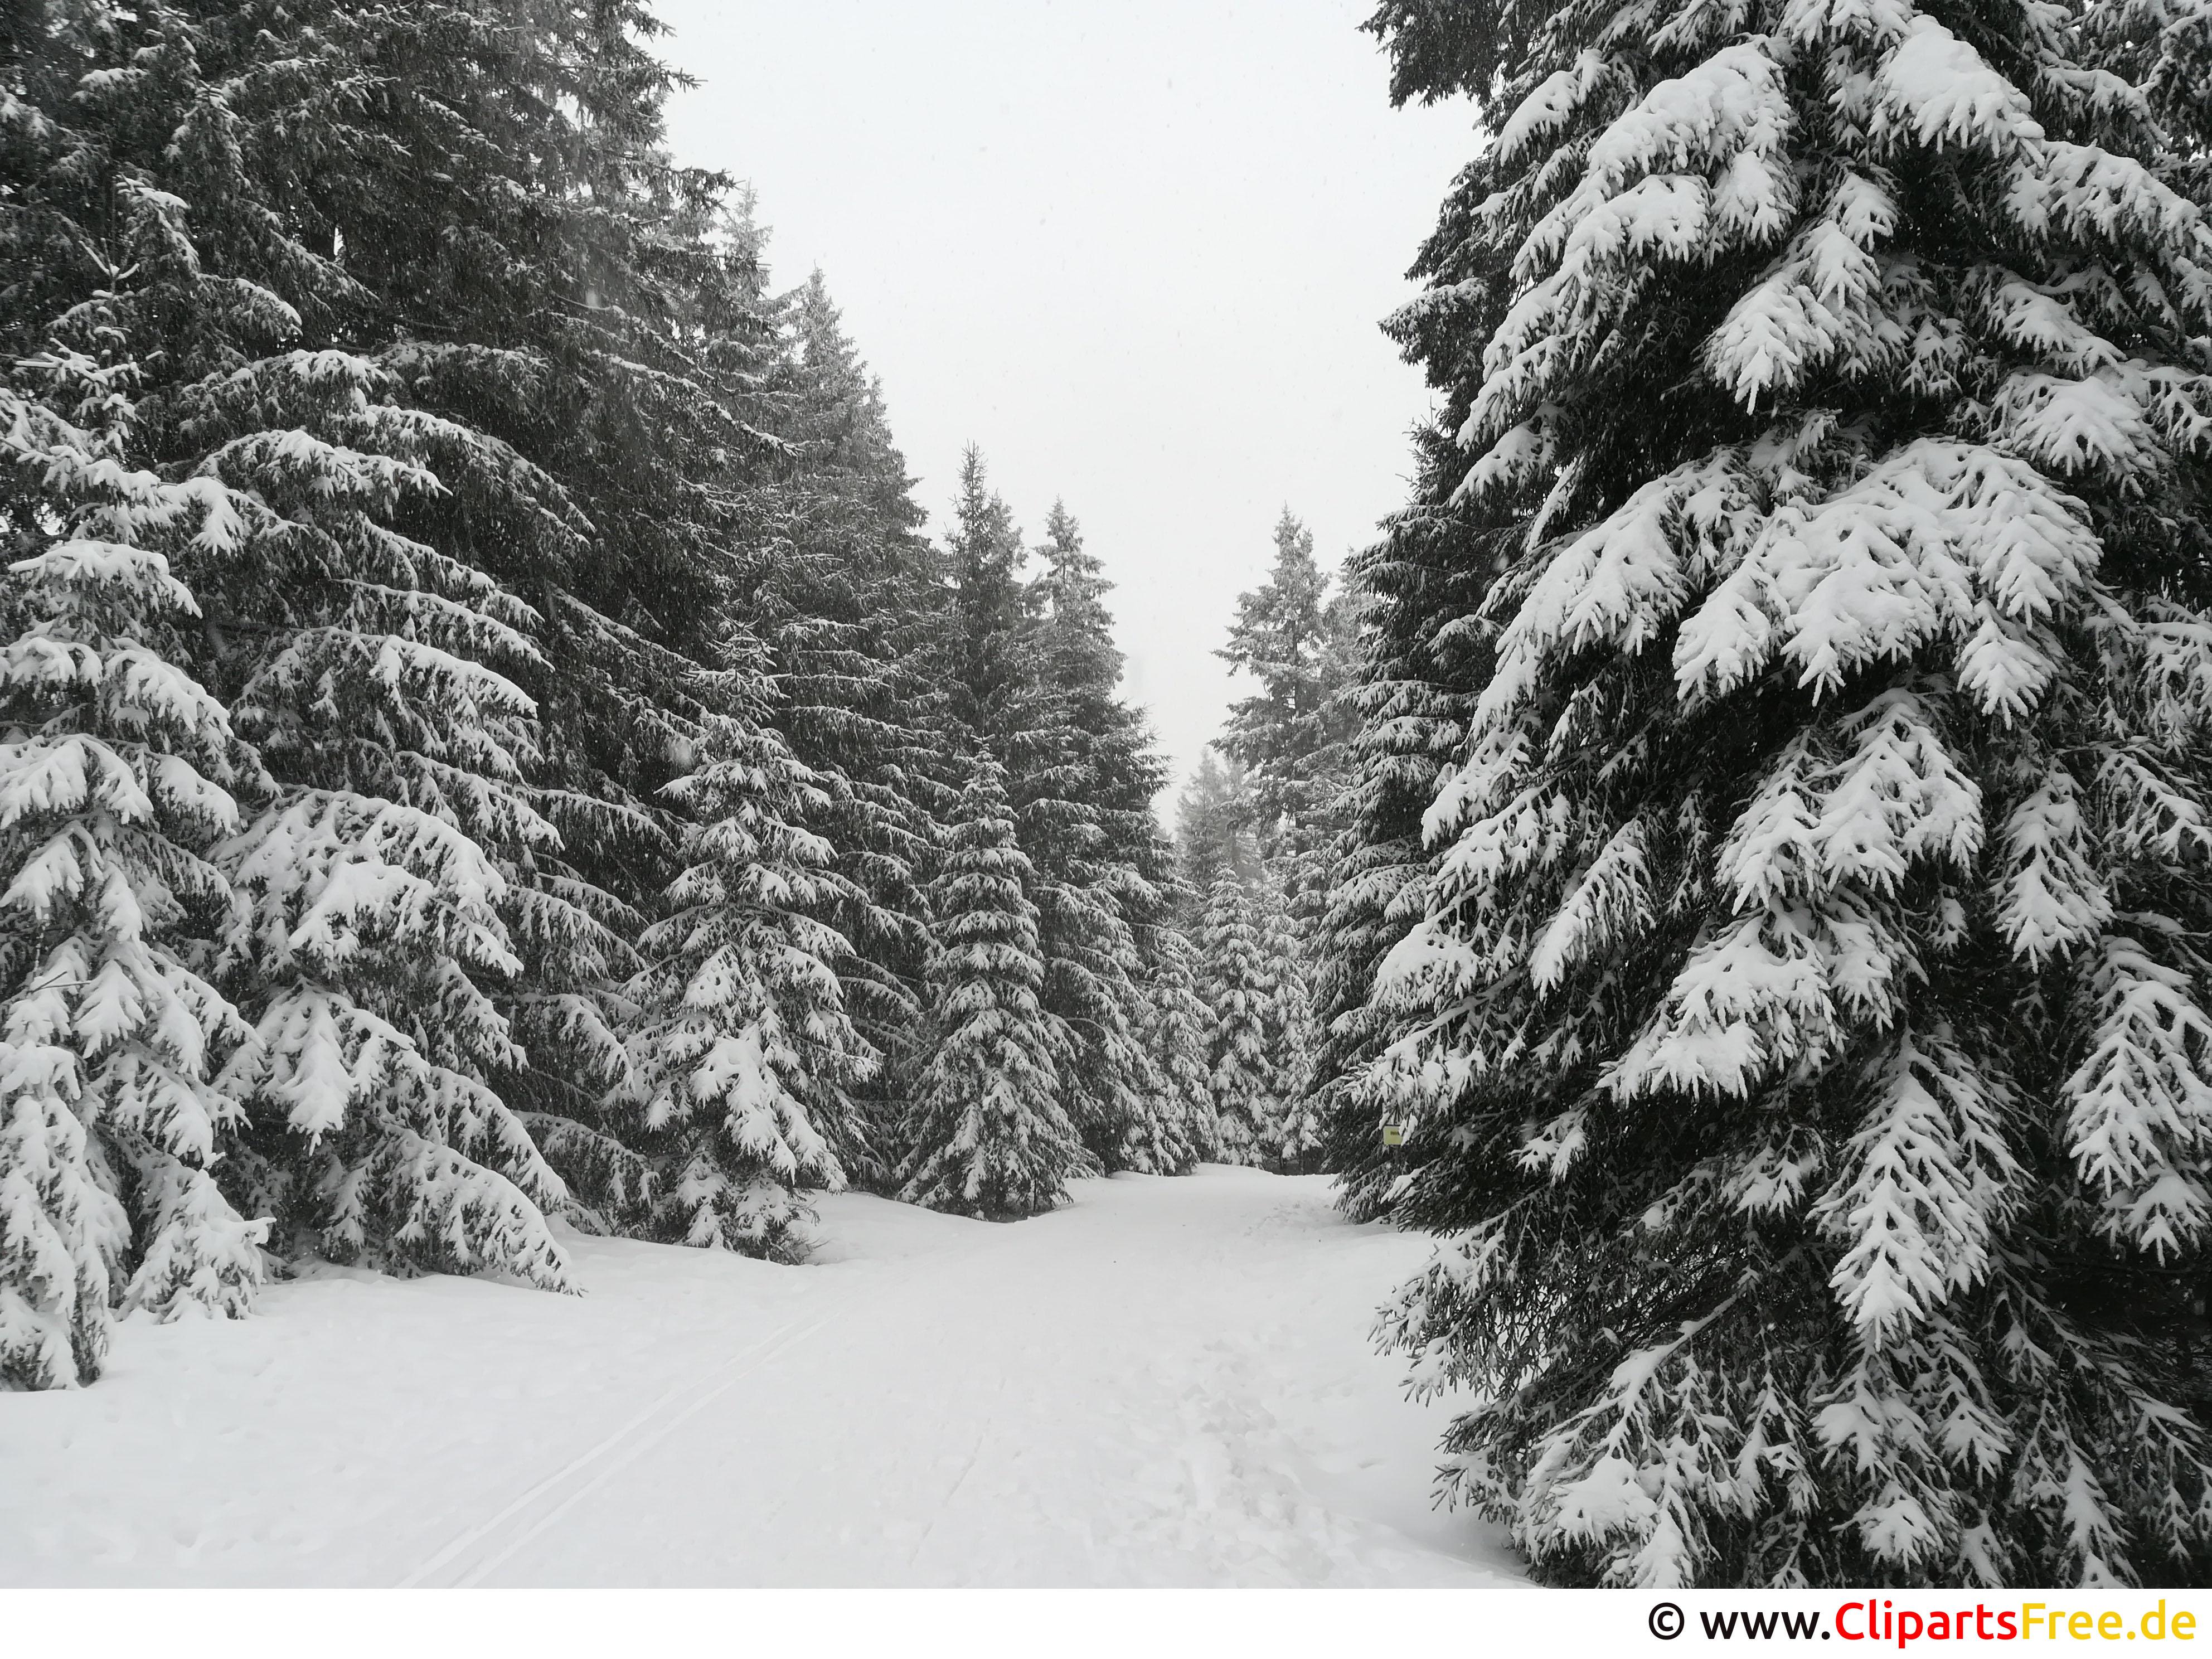 Wald im Winter Bild, Foto, Grafik kostenlos